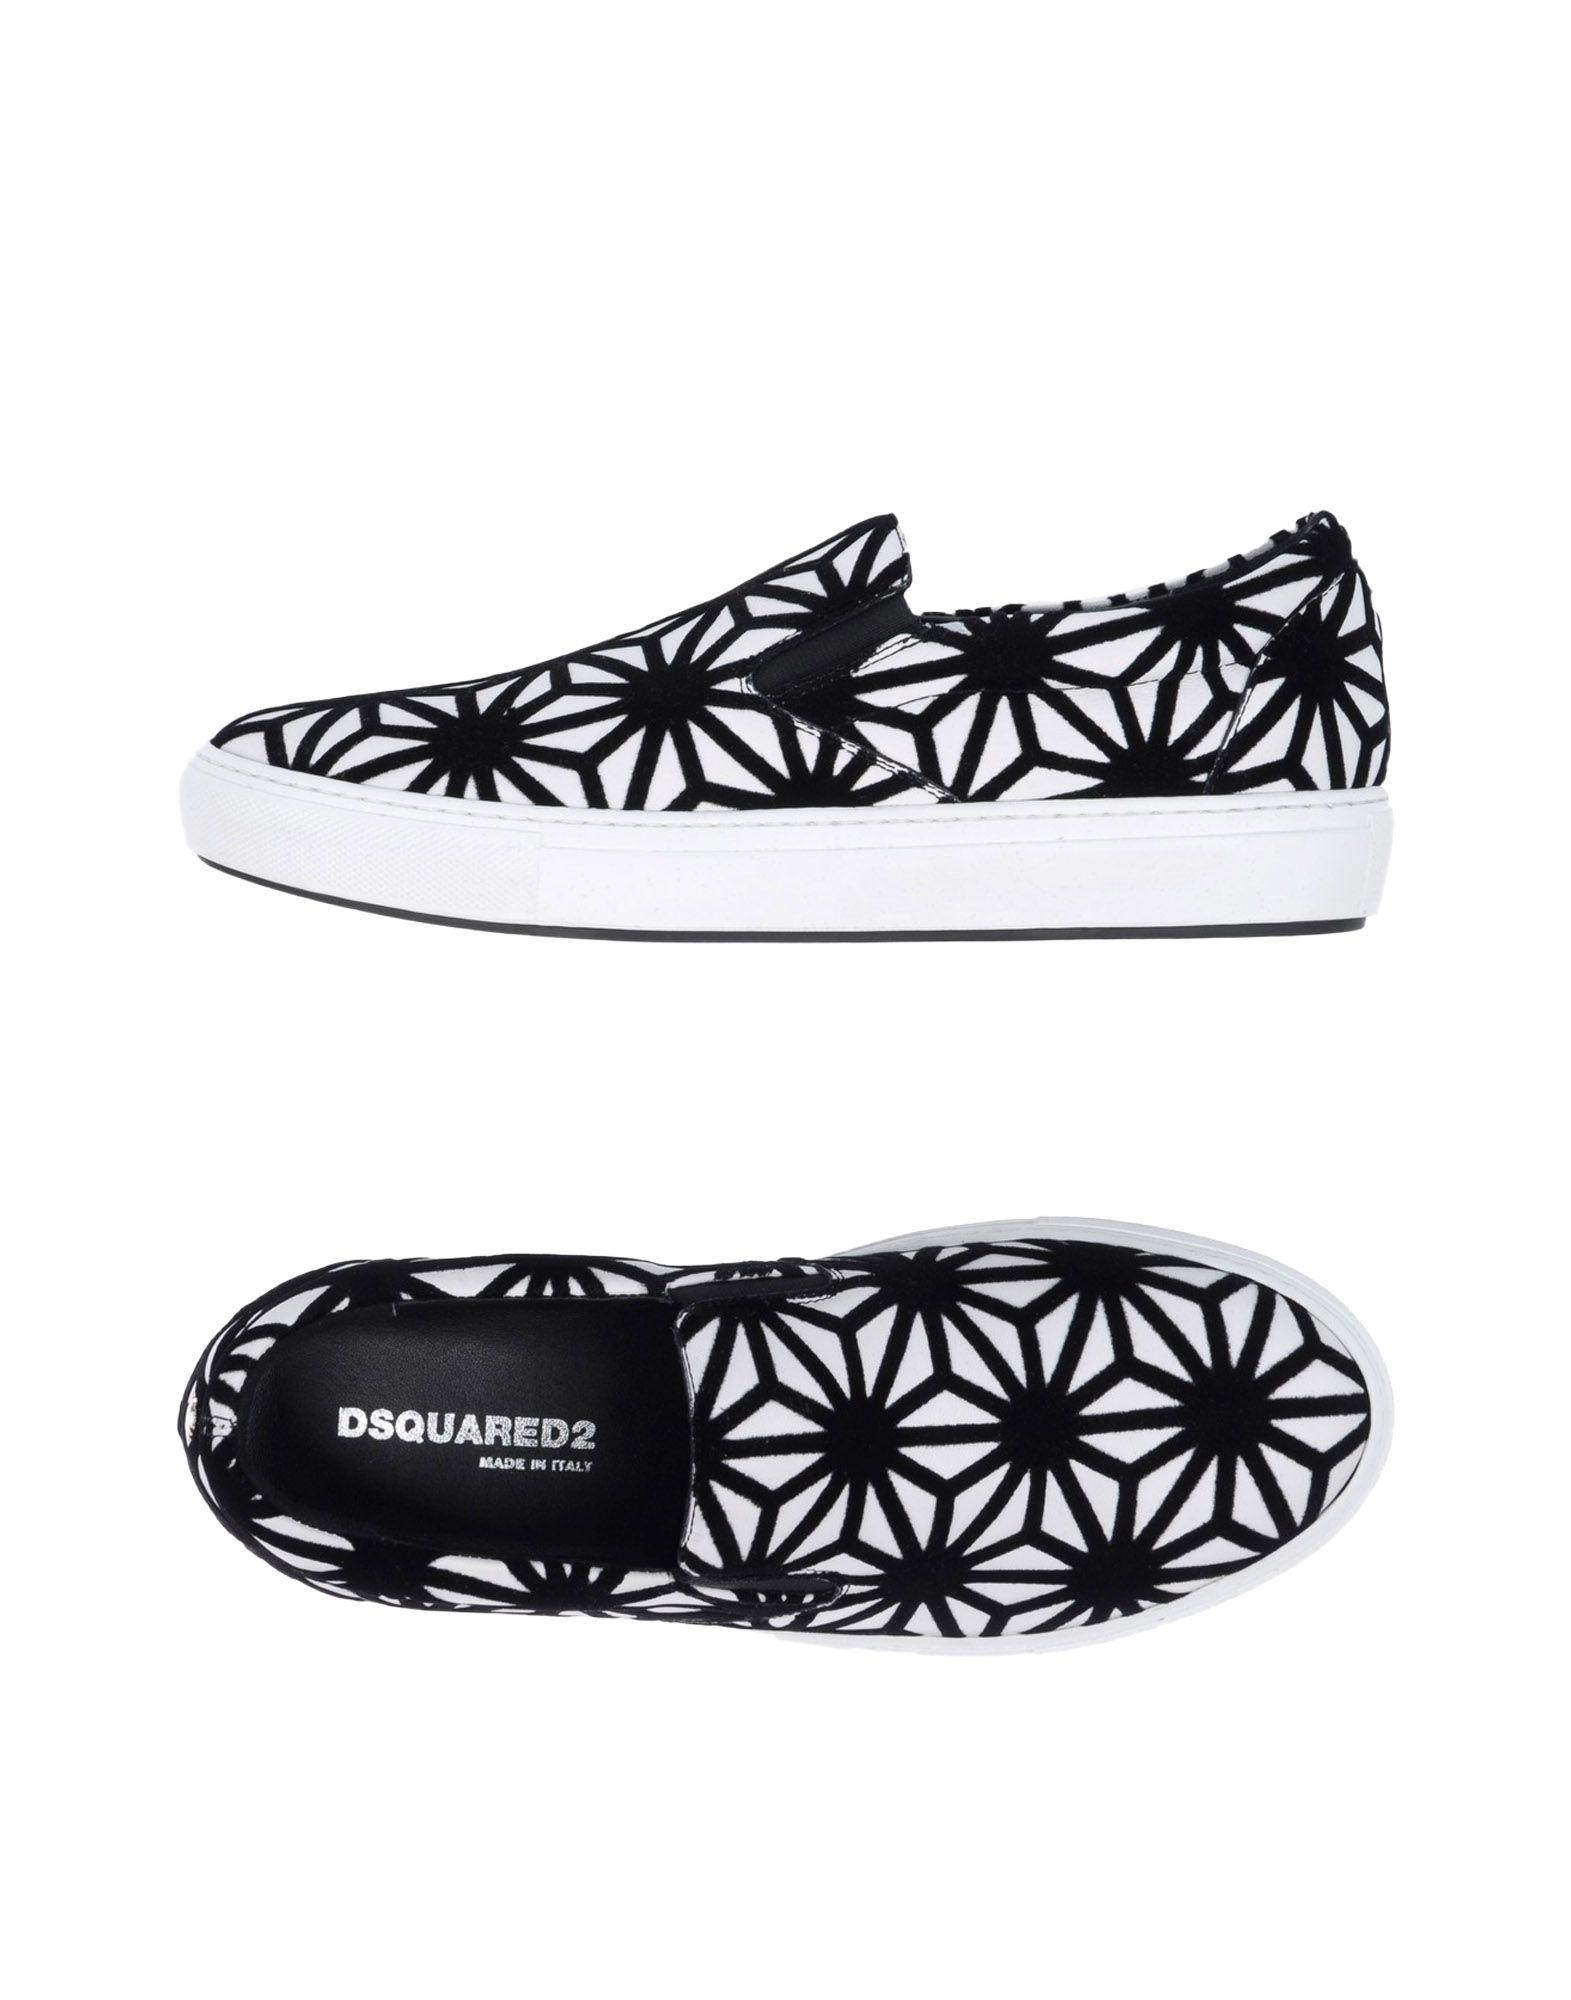 Dsquared2 Sneakers Herren  11301417VM Gute Qualität beliebte Schuhe